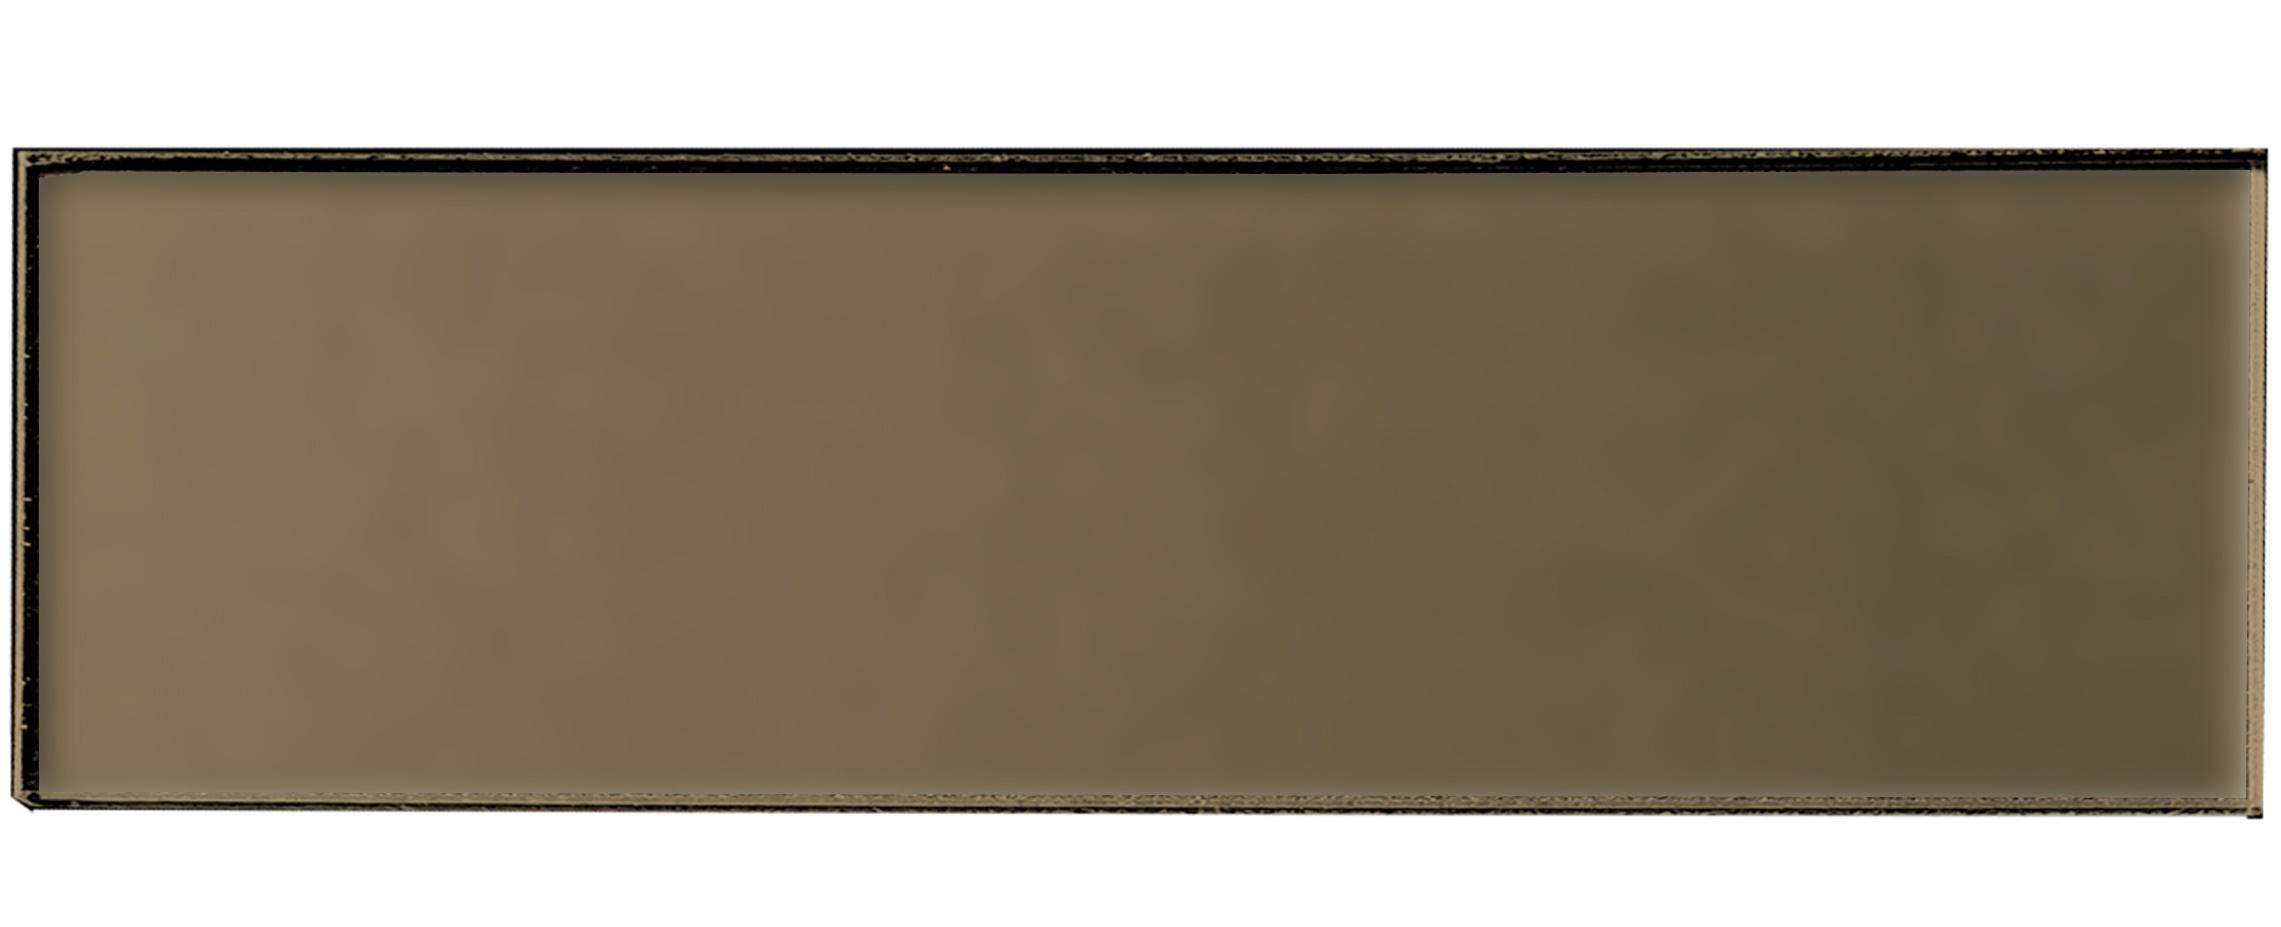 "Forever 4"" x 16"" Matte Bronze Glass Subway Backsplash Wall Tile"